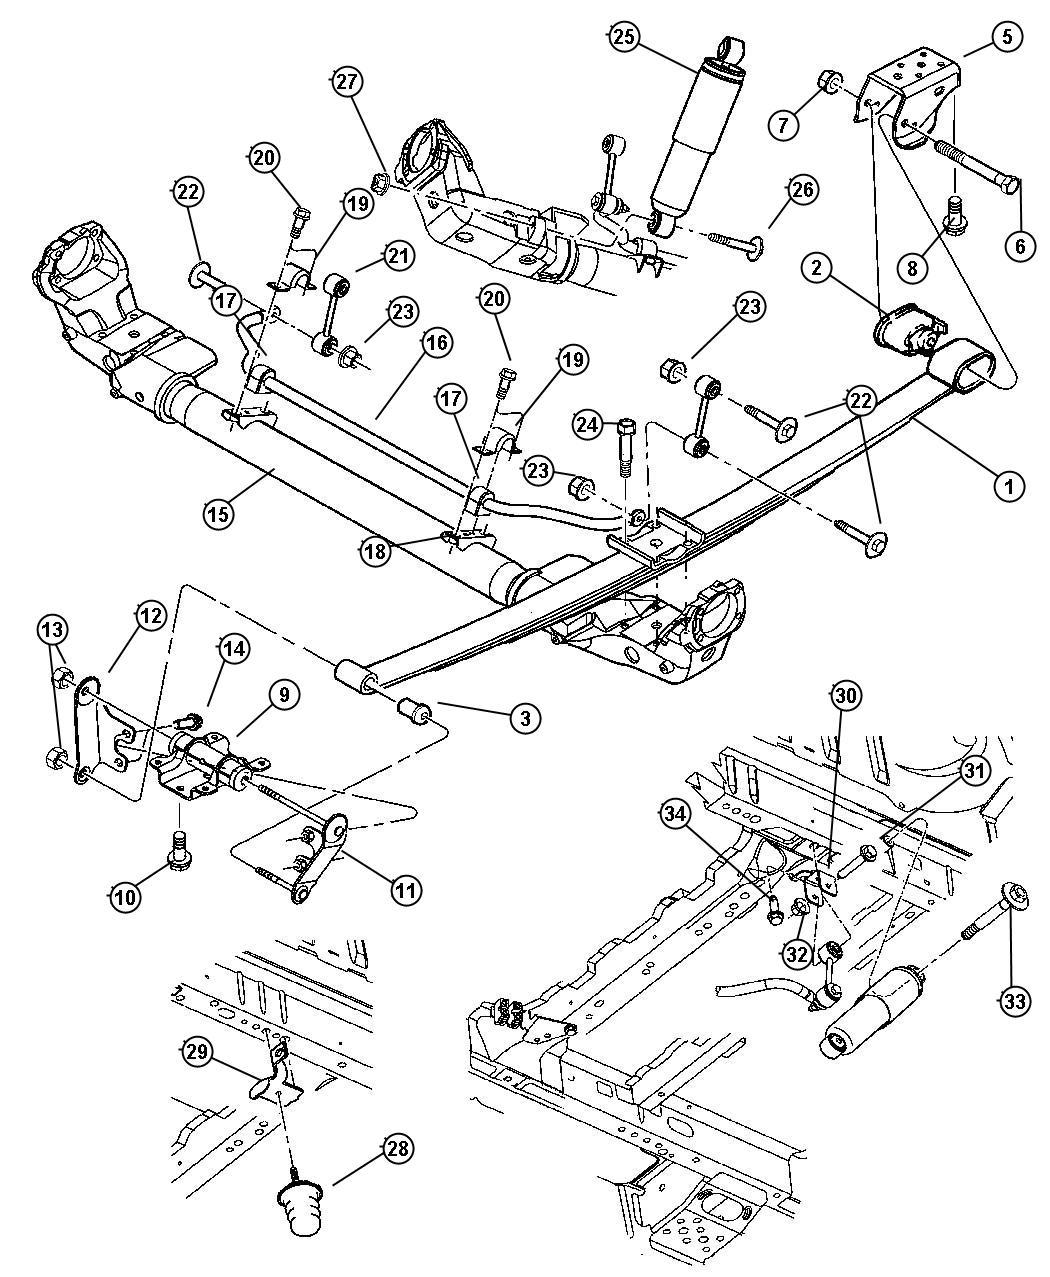 Suspension, Rear-All Wheel Drive